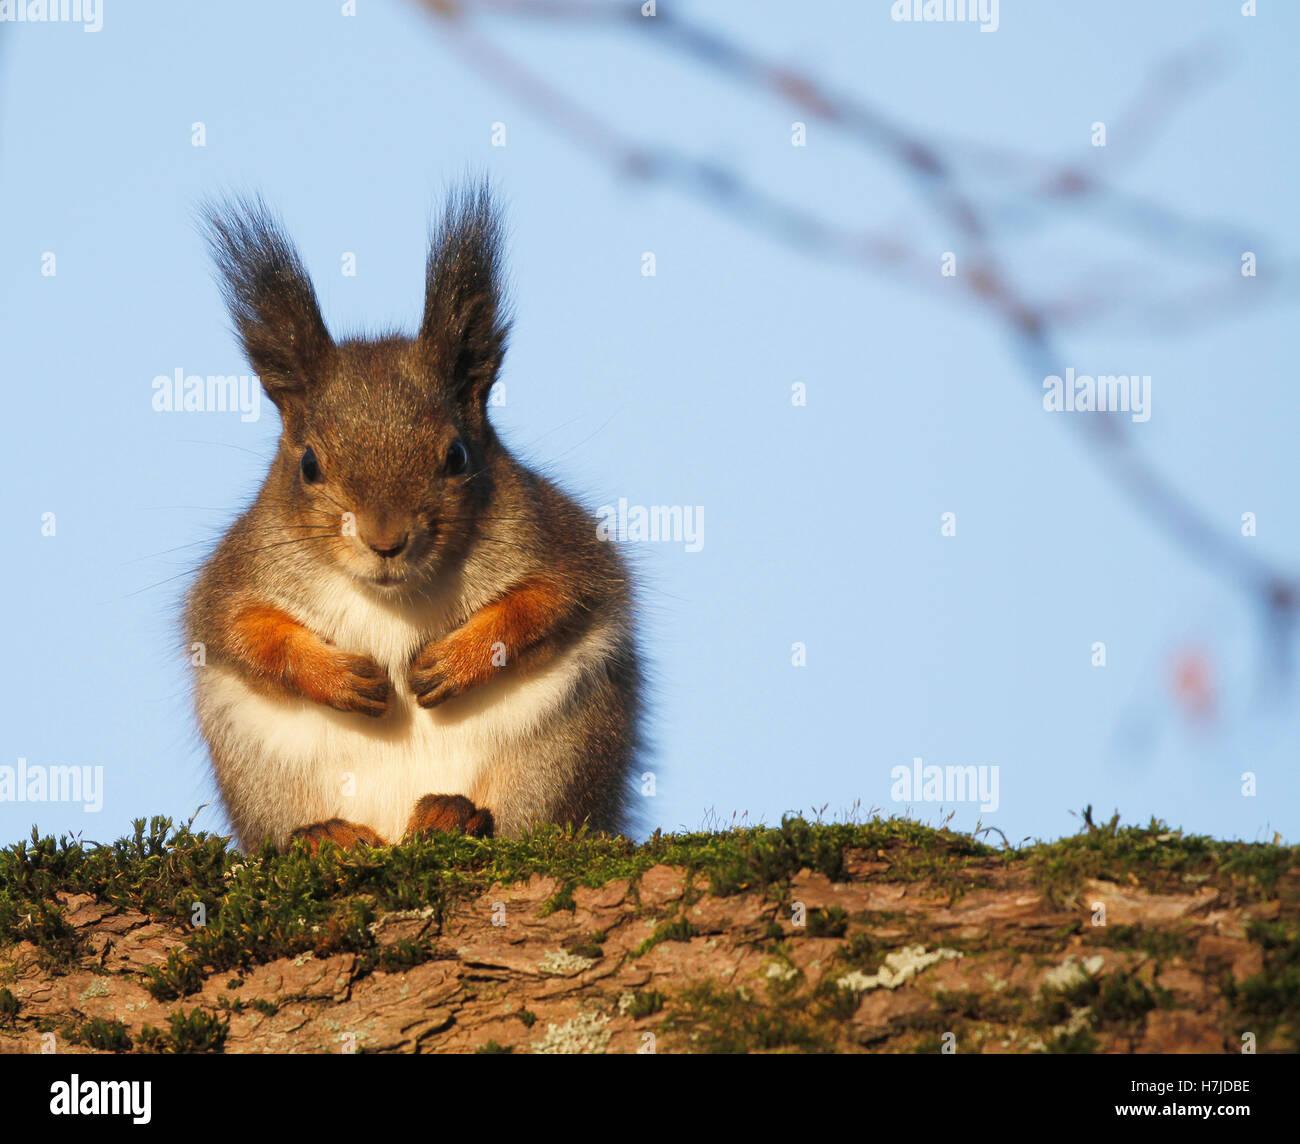 Red Squirrel Sciurus vulgaris sitting on a tree branch in Turku in Finland - Stock Image